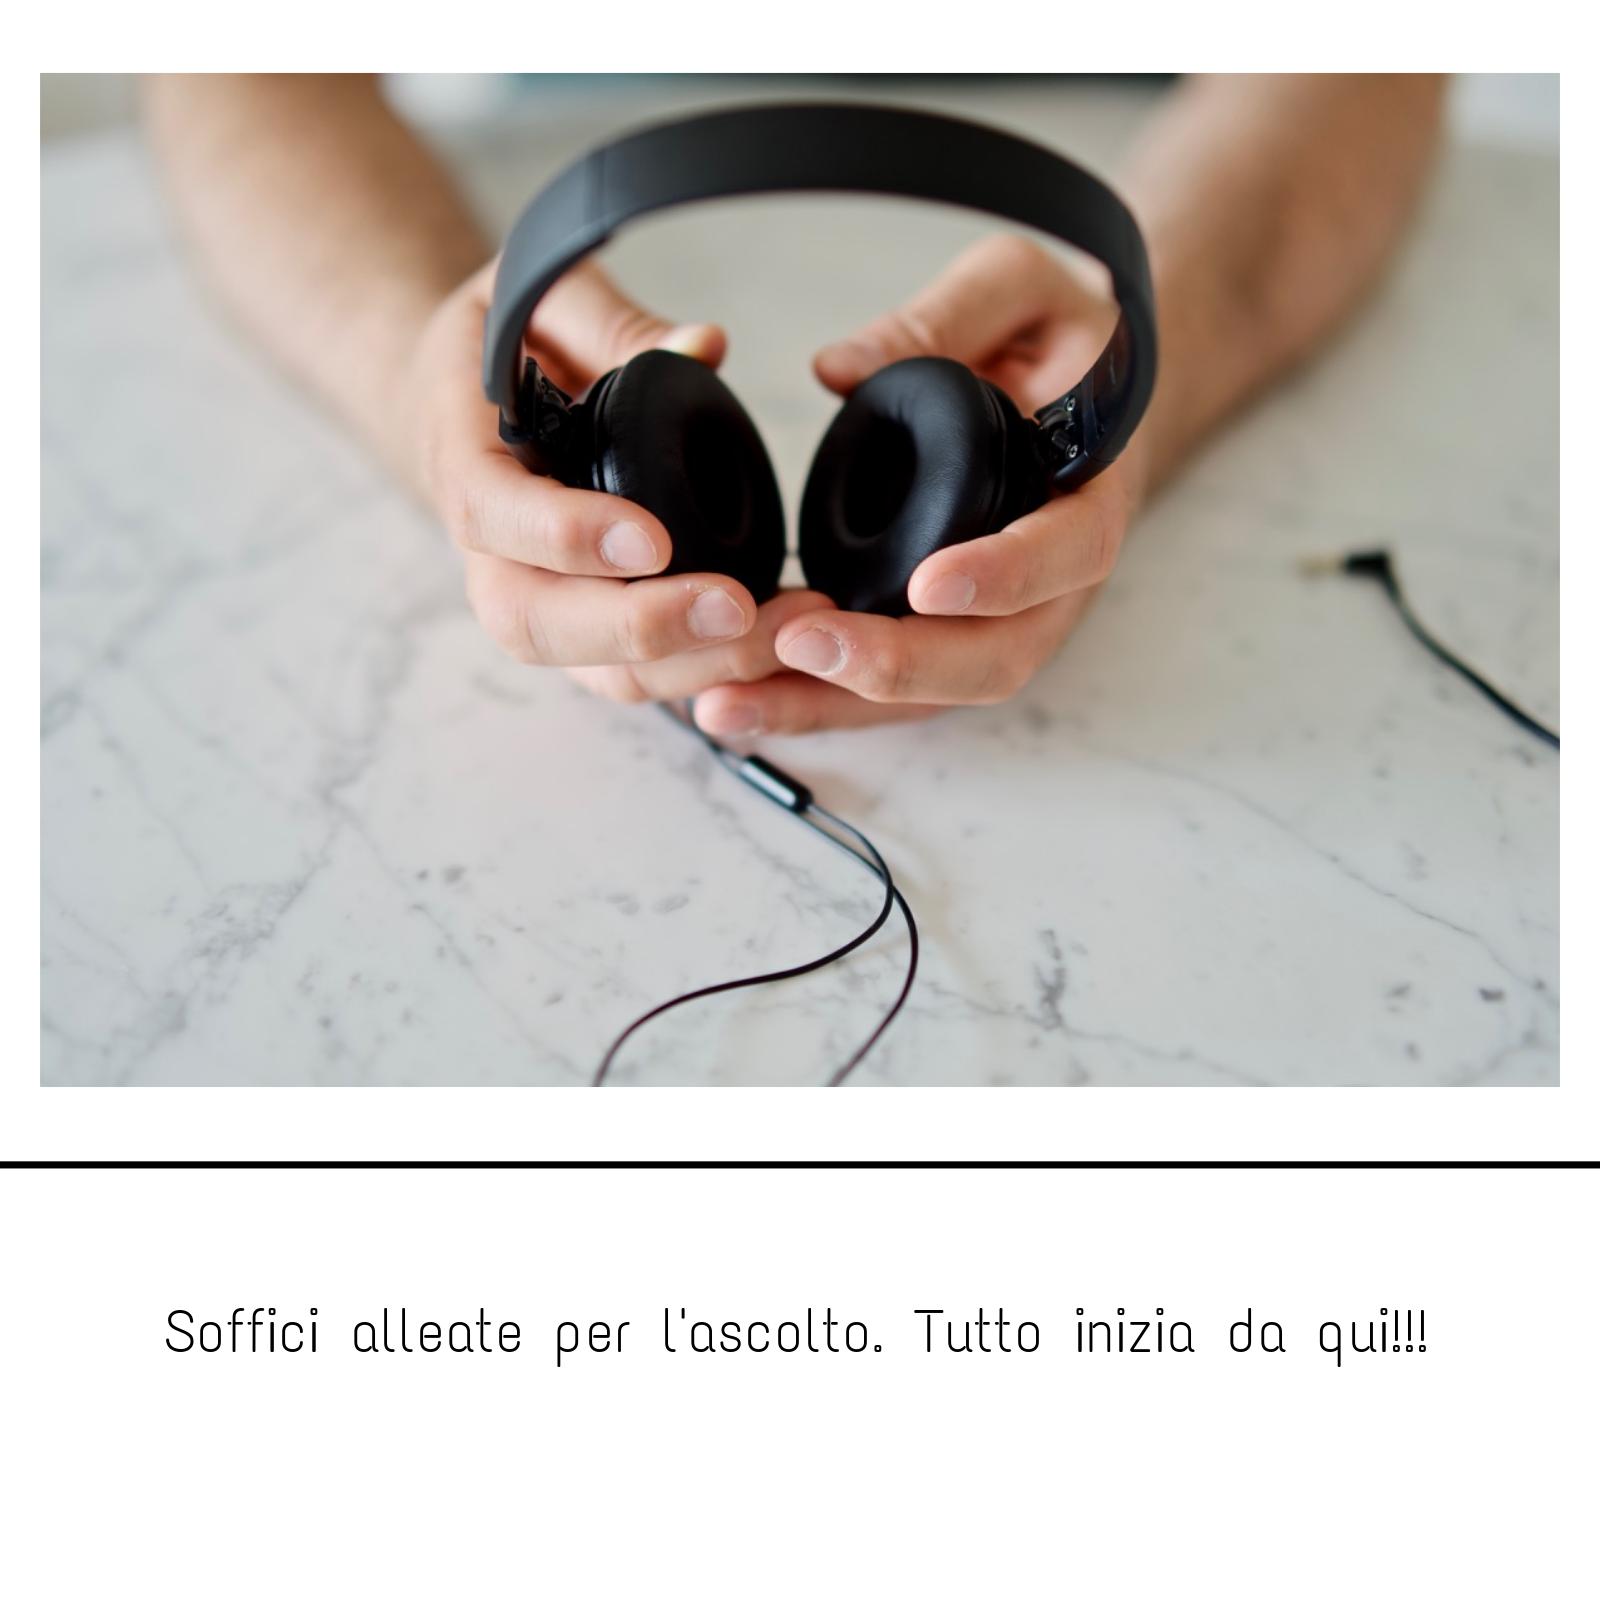 09.effeluciani.com